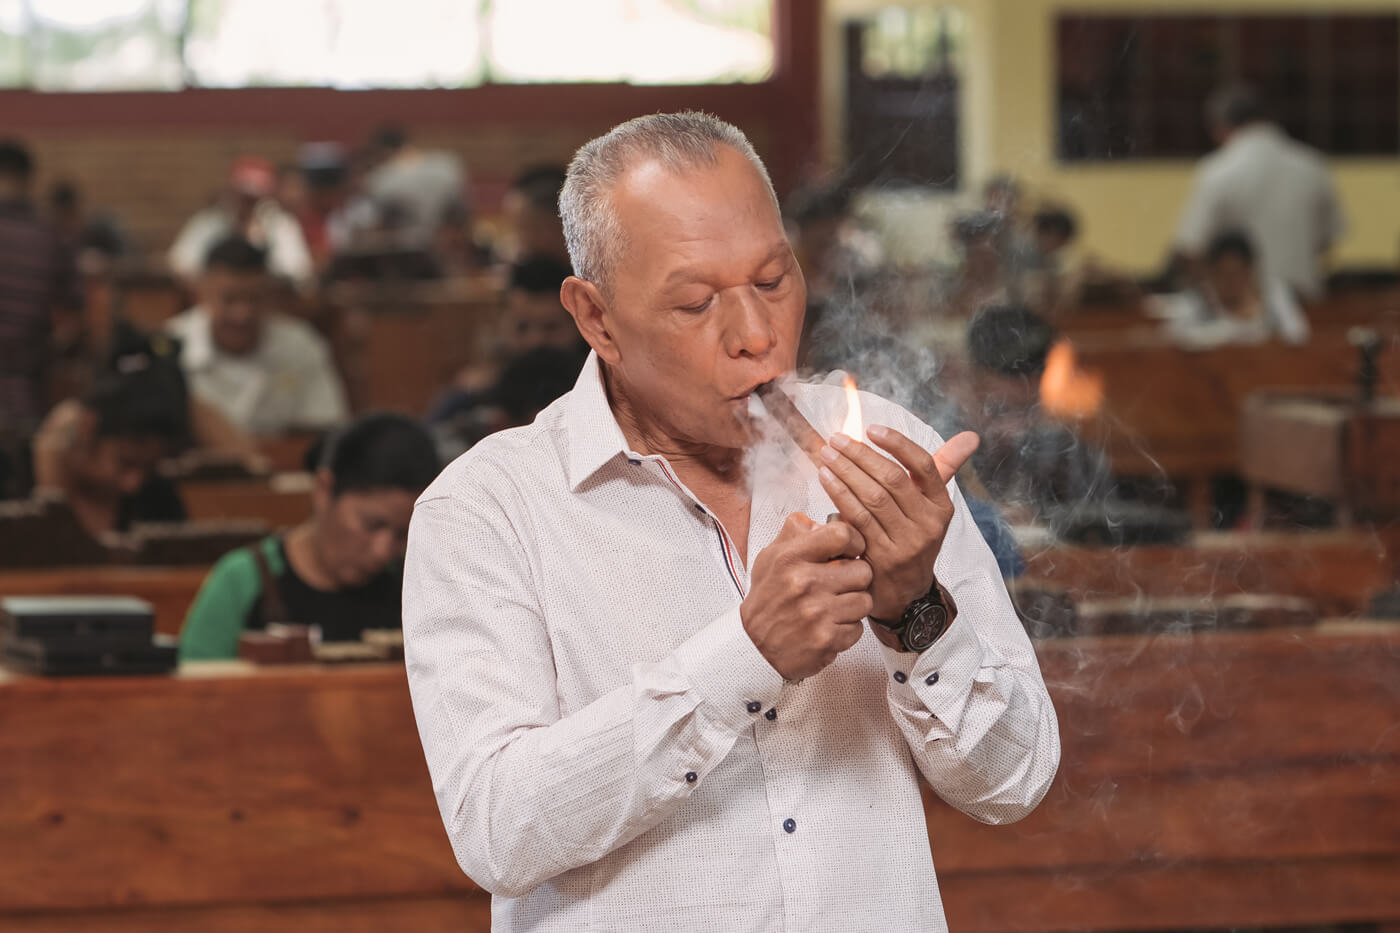 Don-Leo-Joya-de-Nicaragua-5